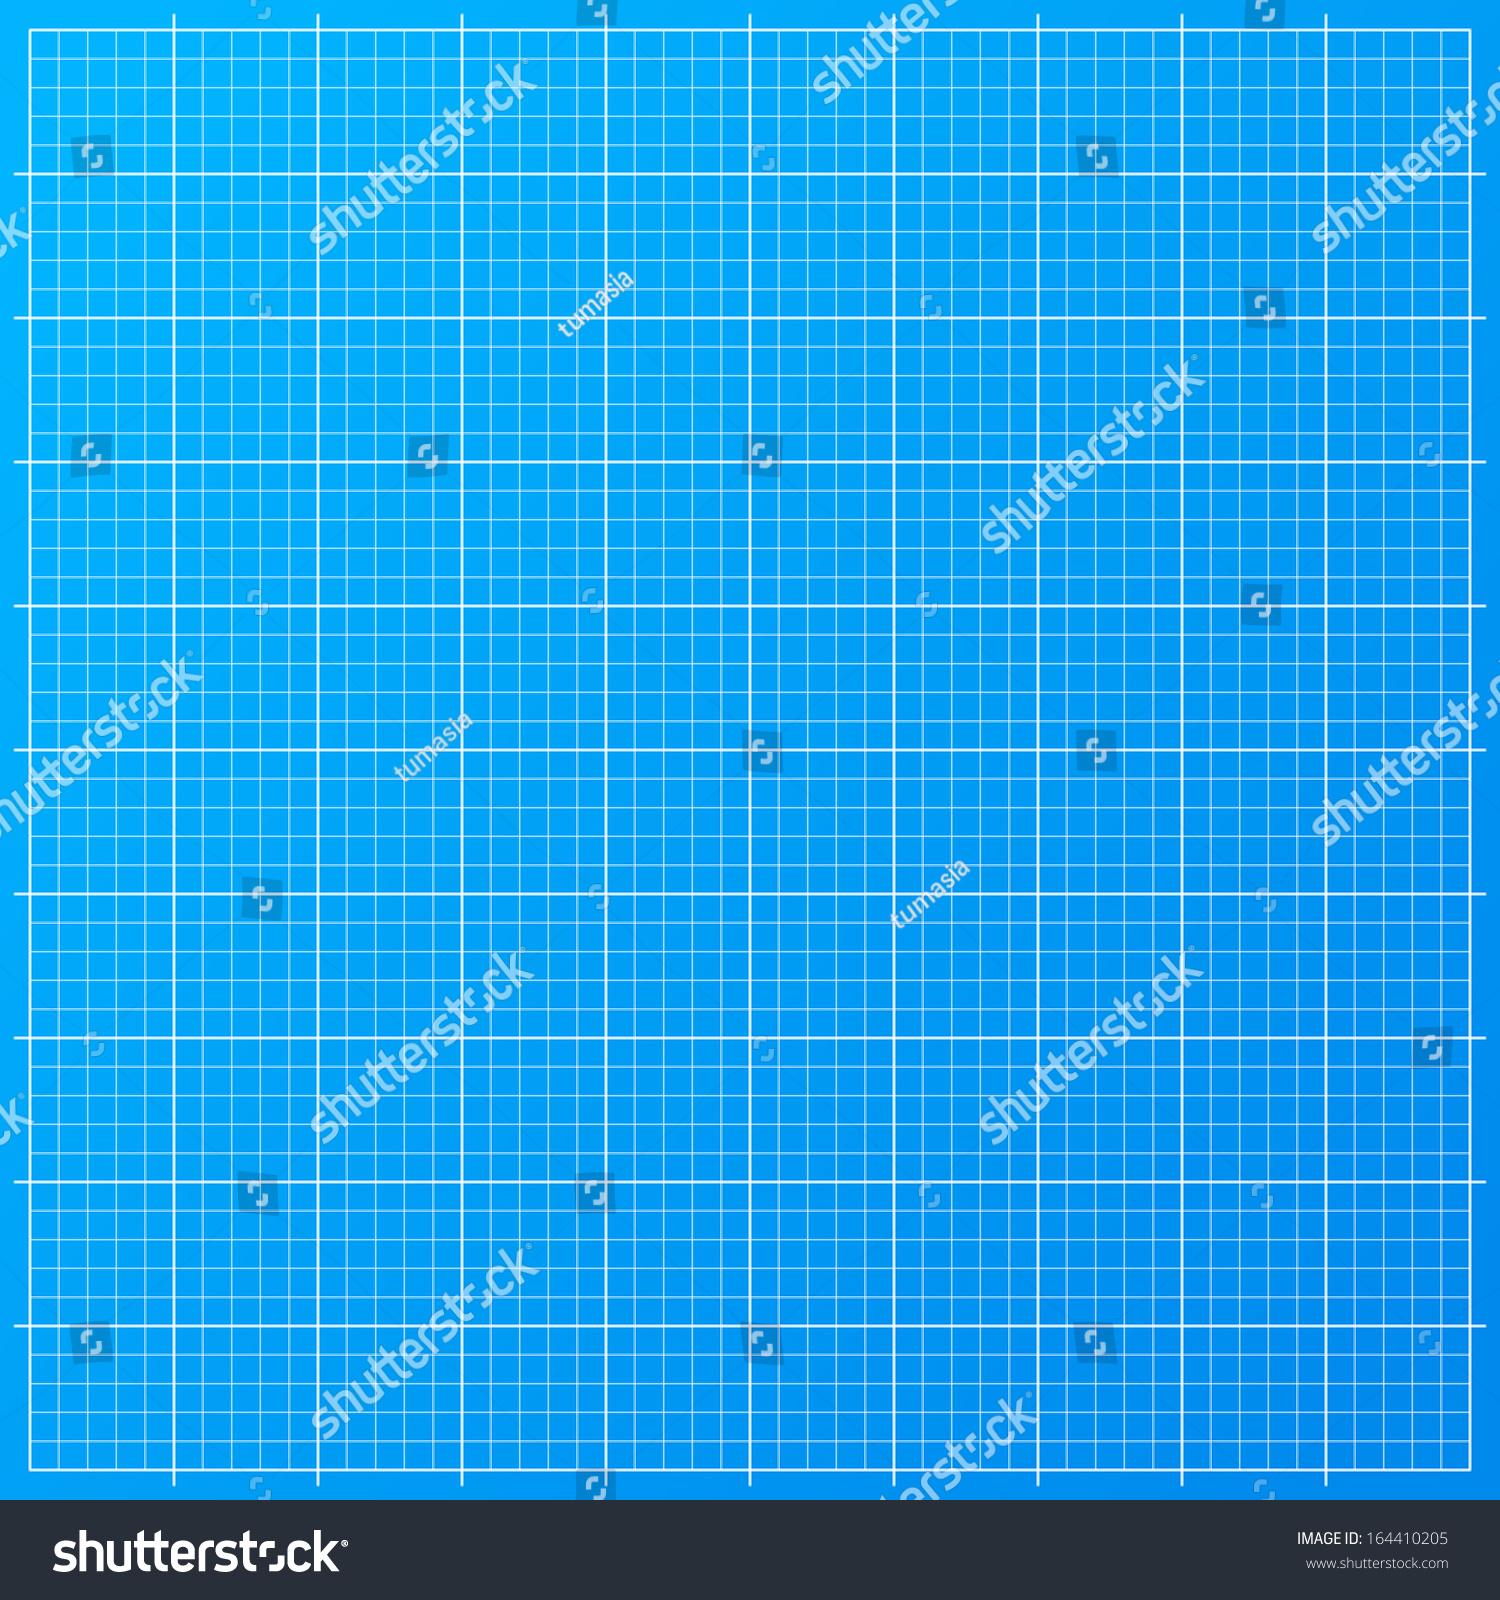 Blueprint background vector illustration eps 10 stock vector blueprint background vector illustration eps 10 malvernweather Gallery